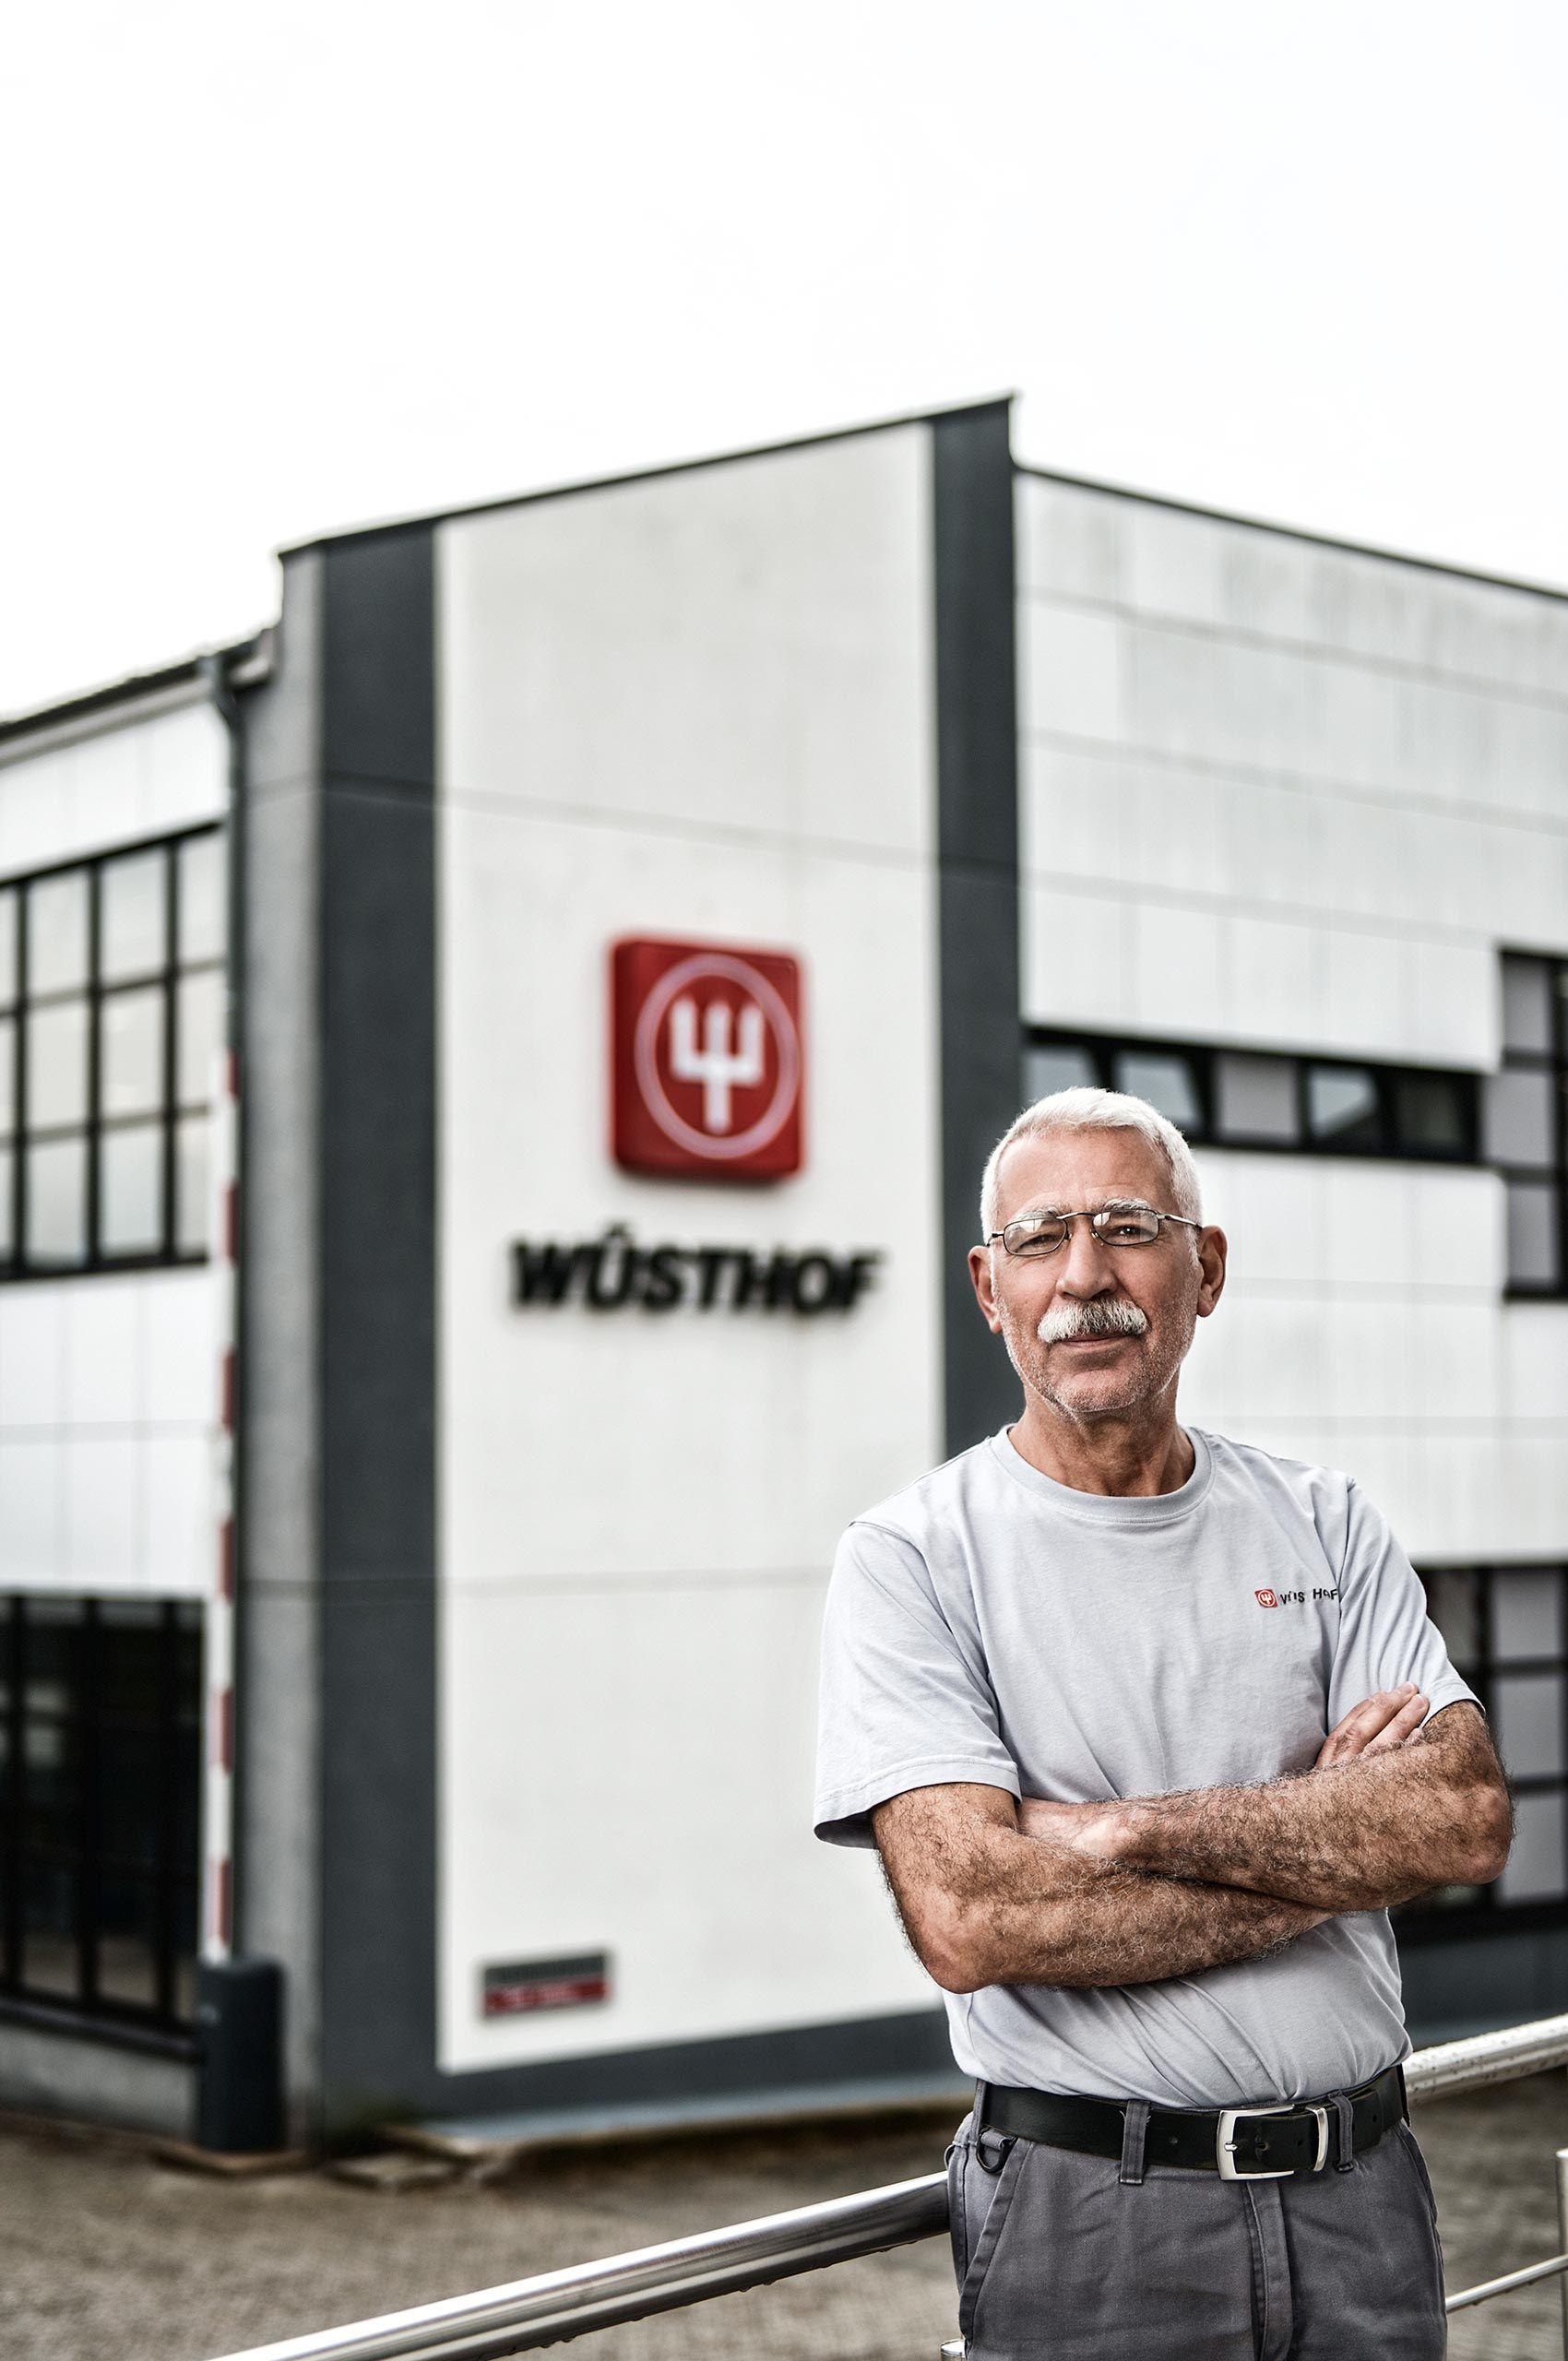 proletariat-wusthof-factory-HenrikOlundPhotography.jpg